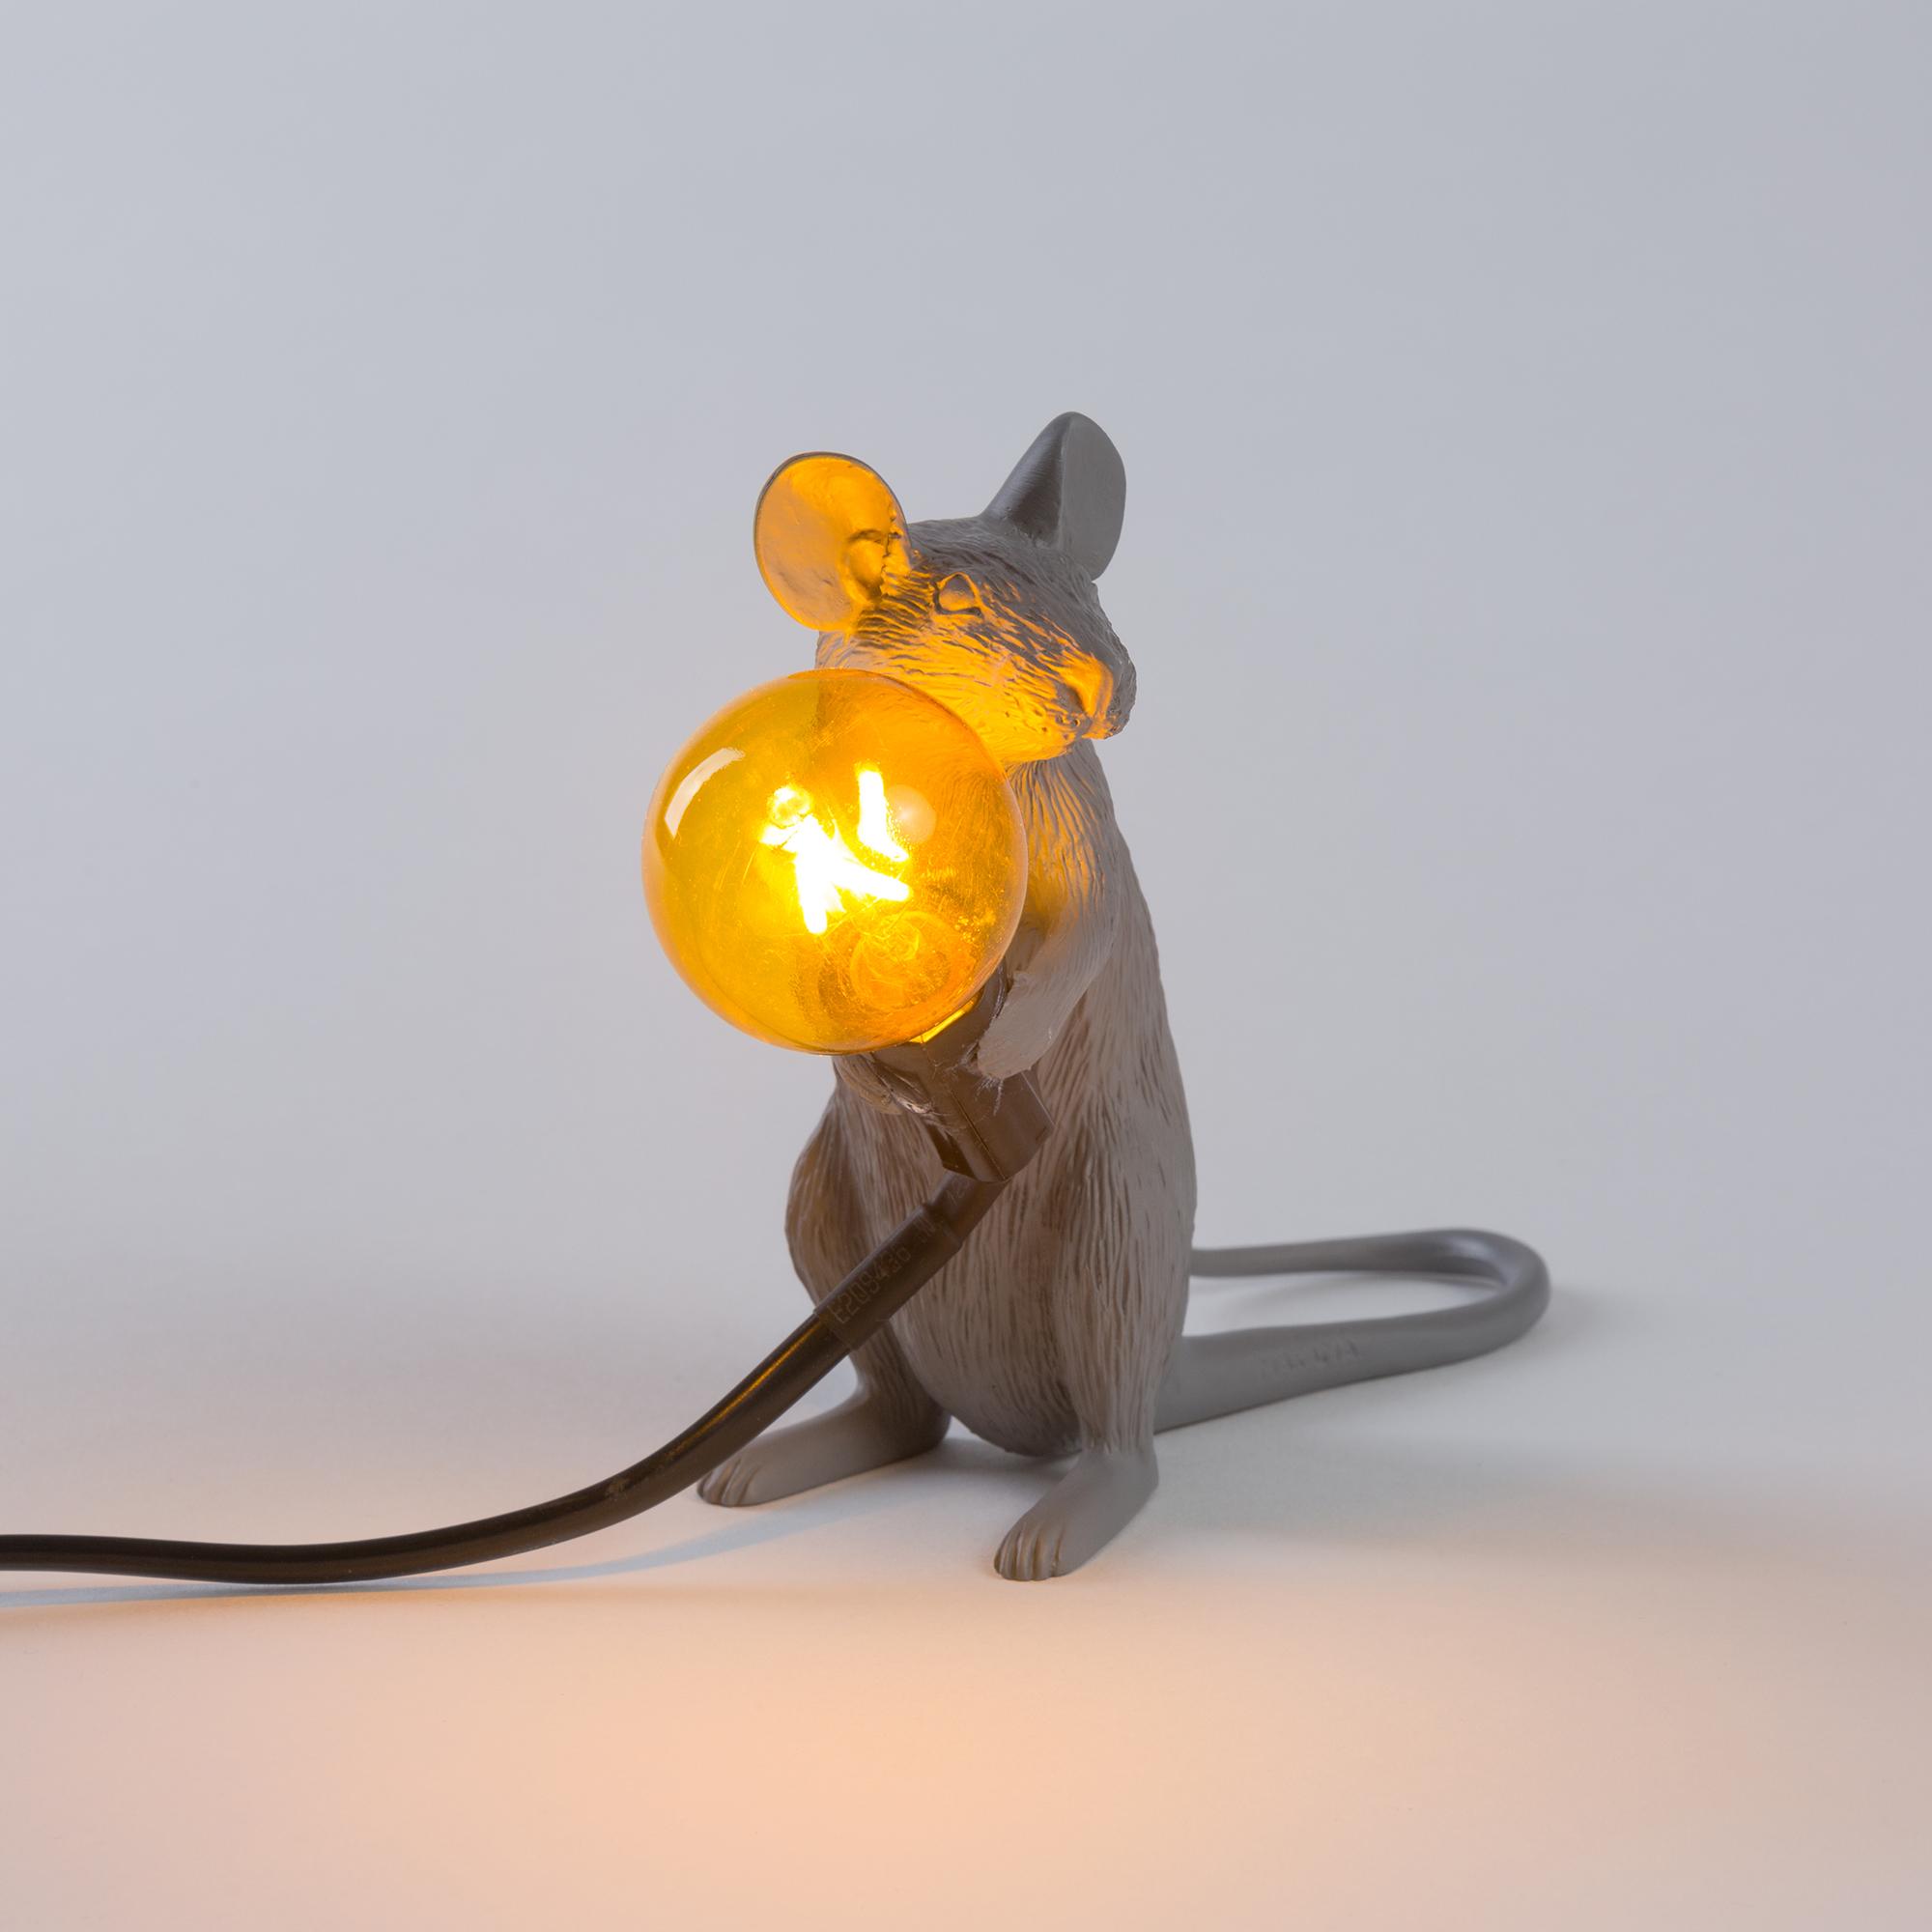 Seletti's Mouse Lamp